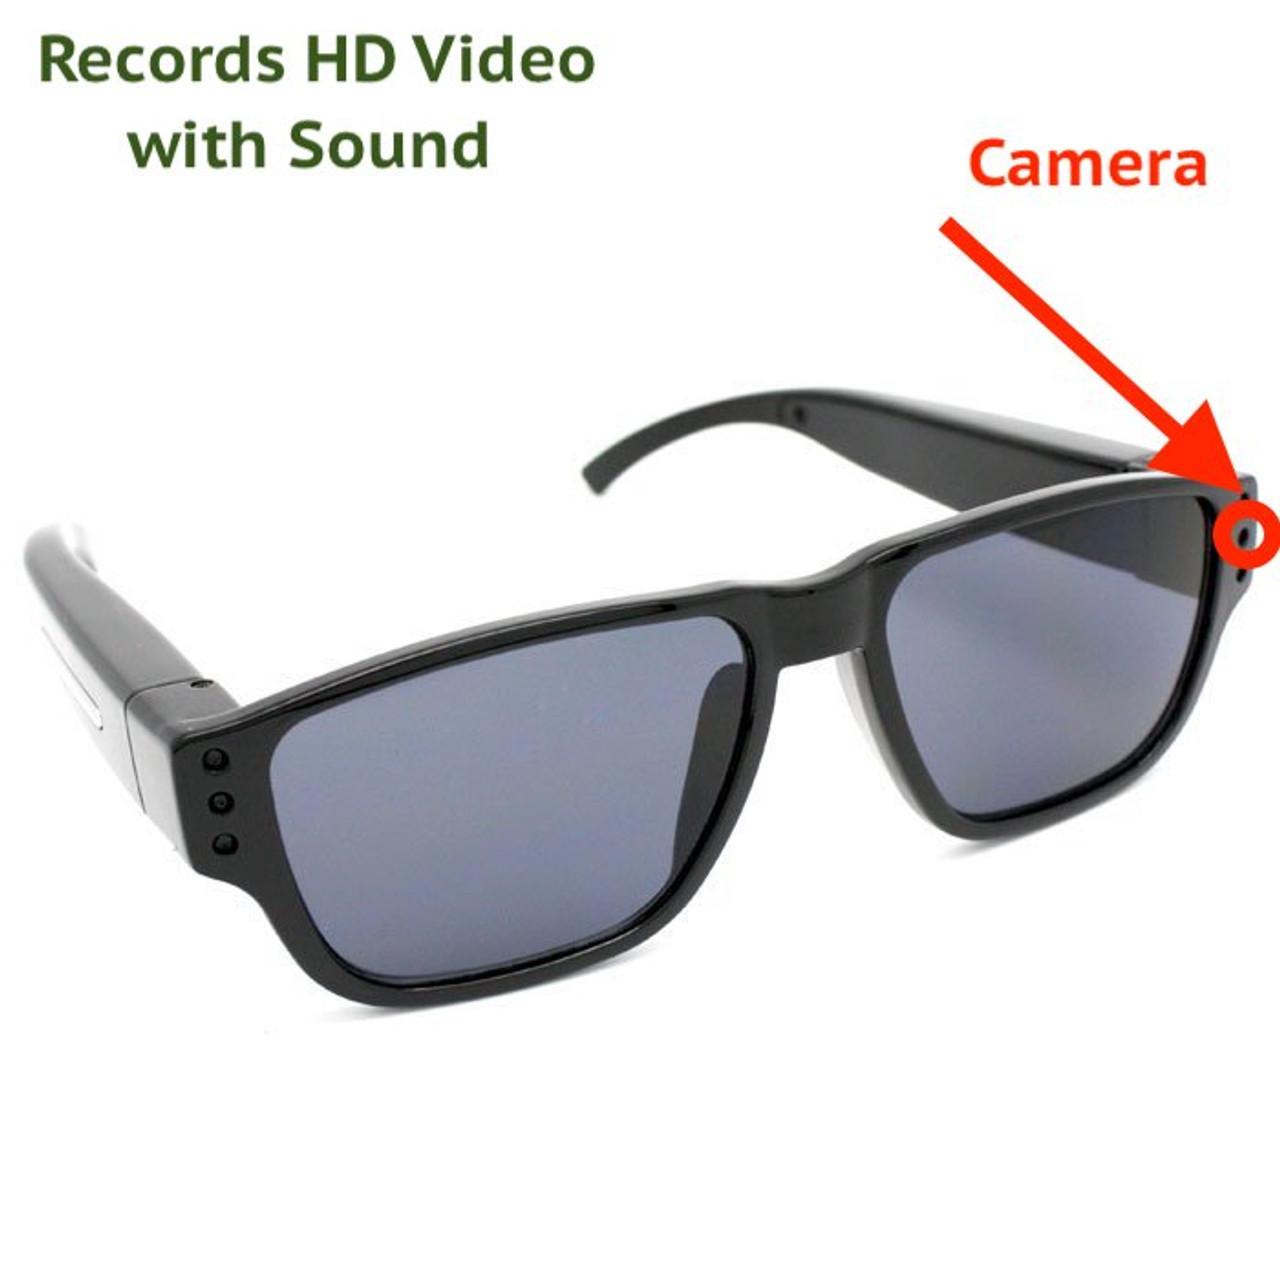 6bd965bc06 720p HD LawMate PV-EG20DL Spy Sunglasses Glasses Video Hidden Camera DVR  Audio